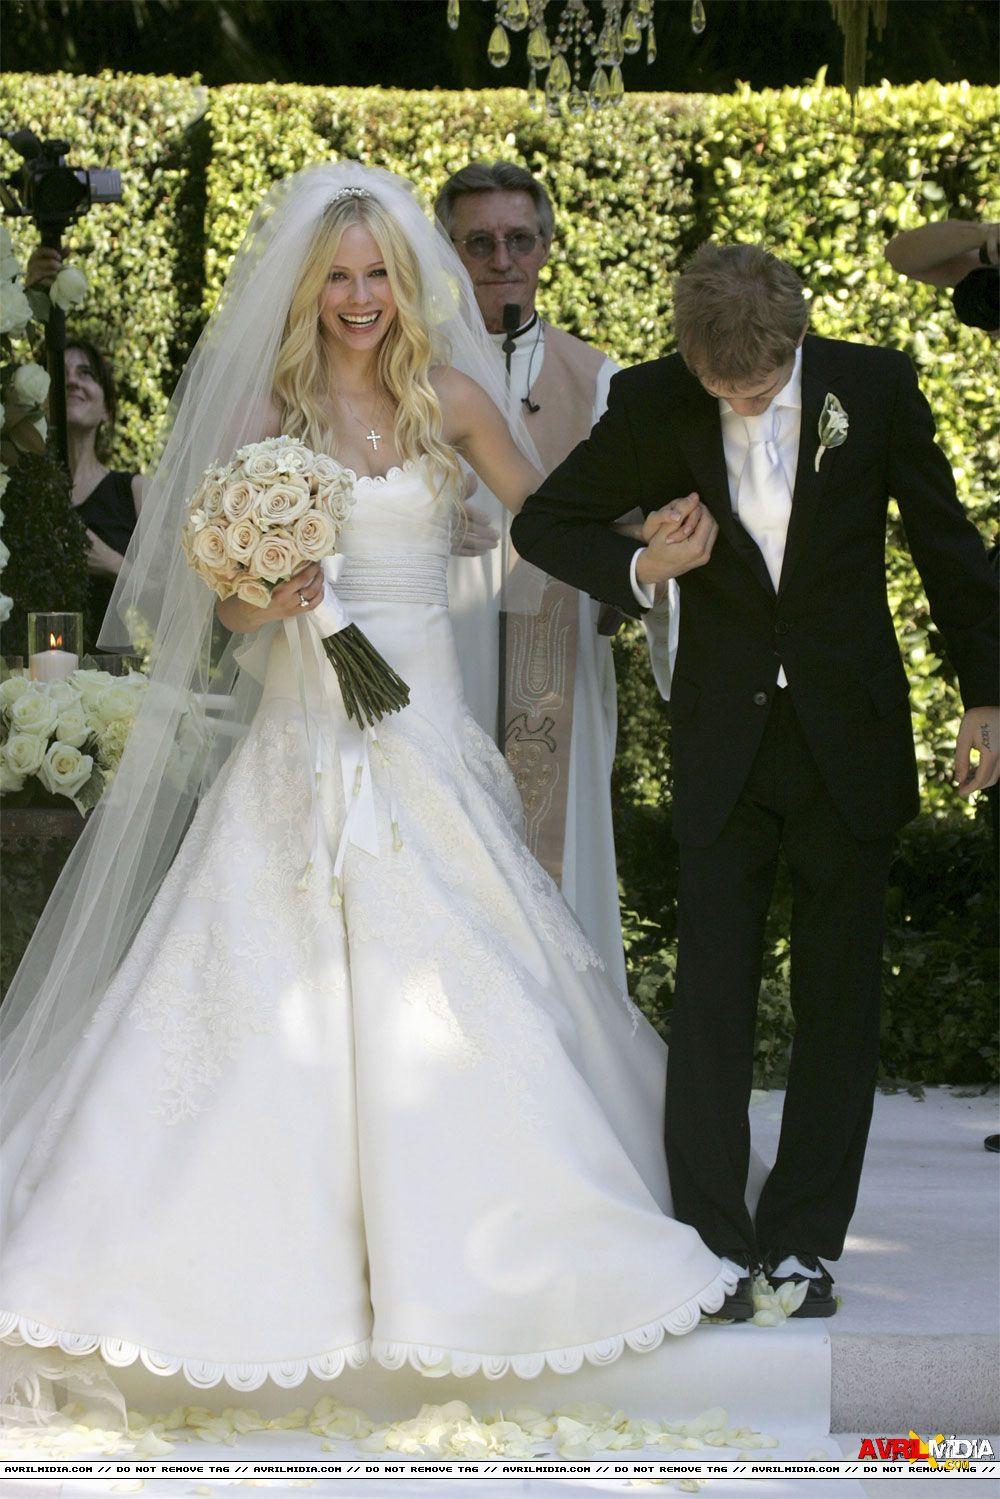 Avril Lavigne Deryck Whibley 2006 Wedding Dress Shapes Brides Wedding Dress Wedding Bridal Veils